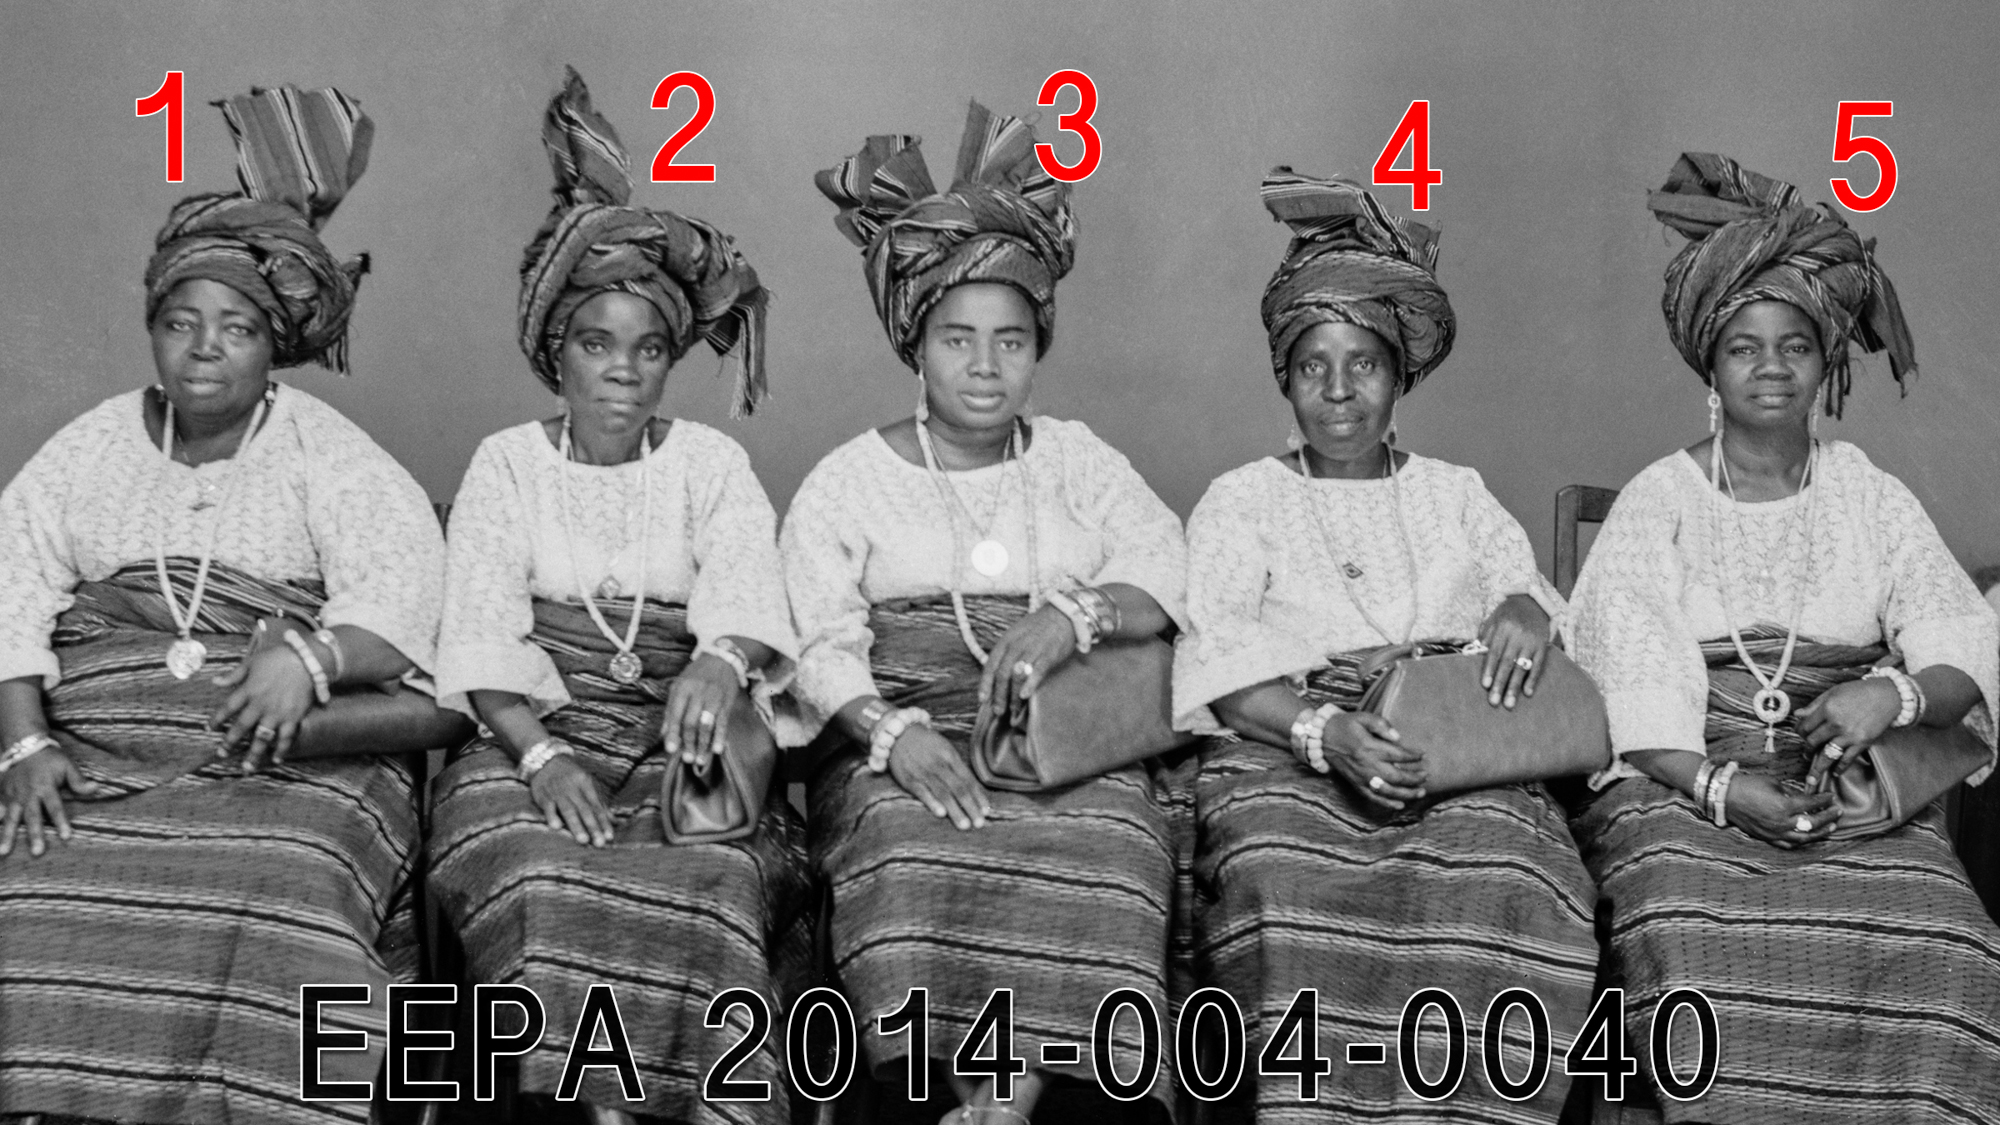 EEPA_2014-004-0040-M.jpg